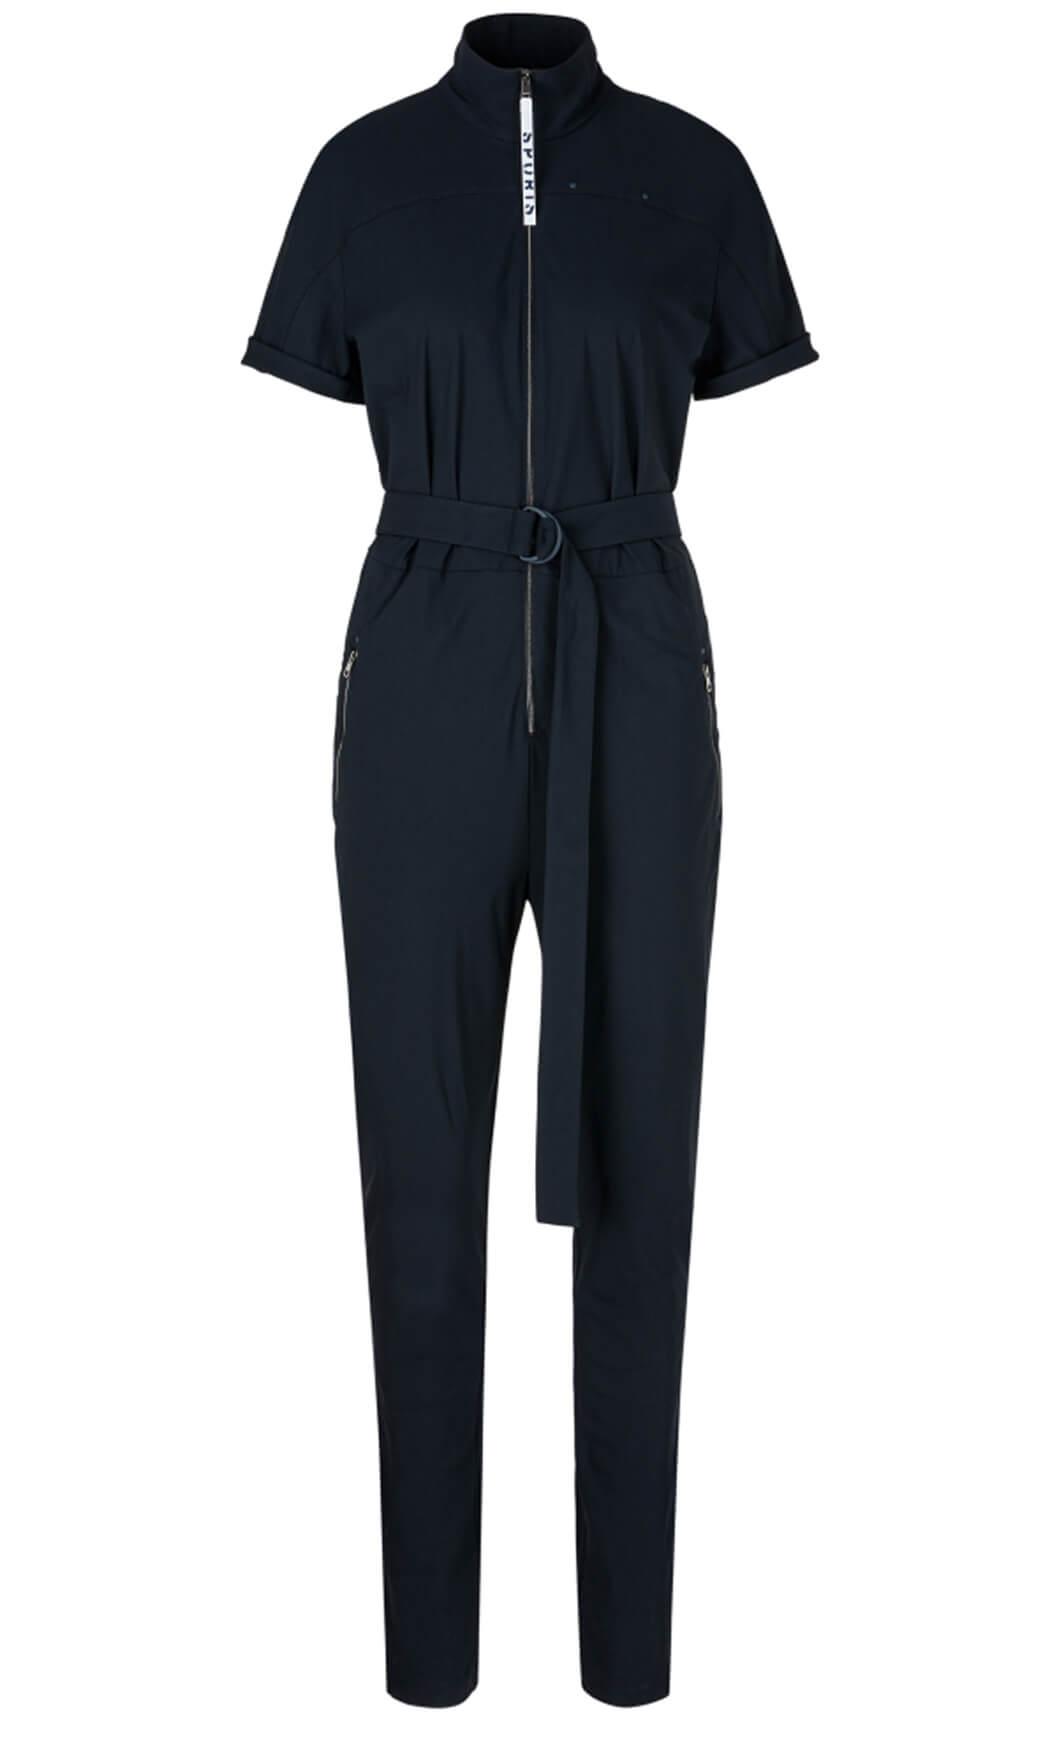 Marccain Sports Dames Jumpsuit zwart